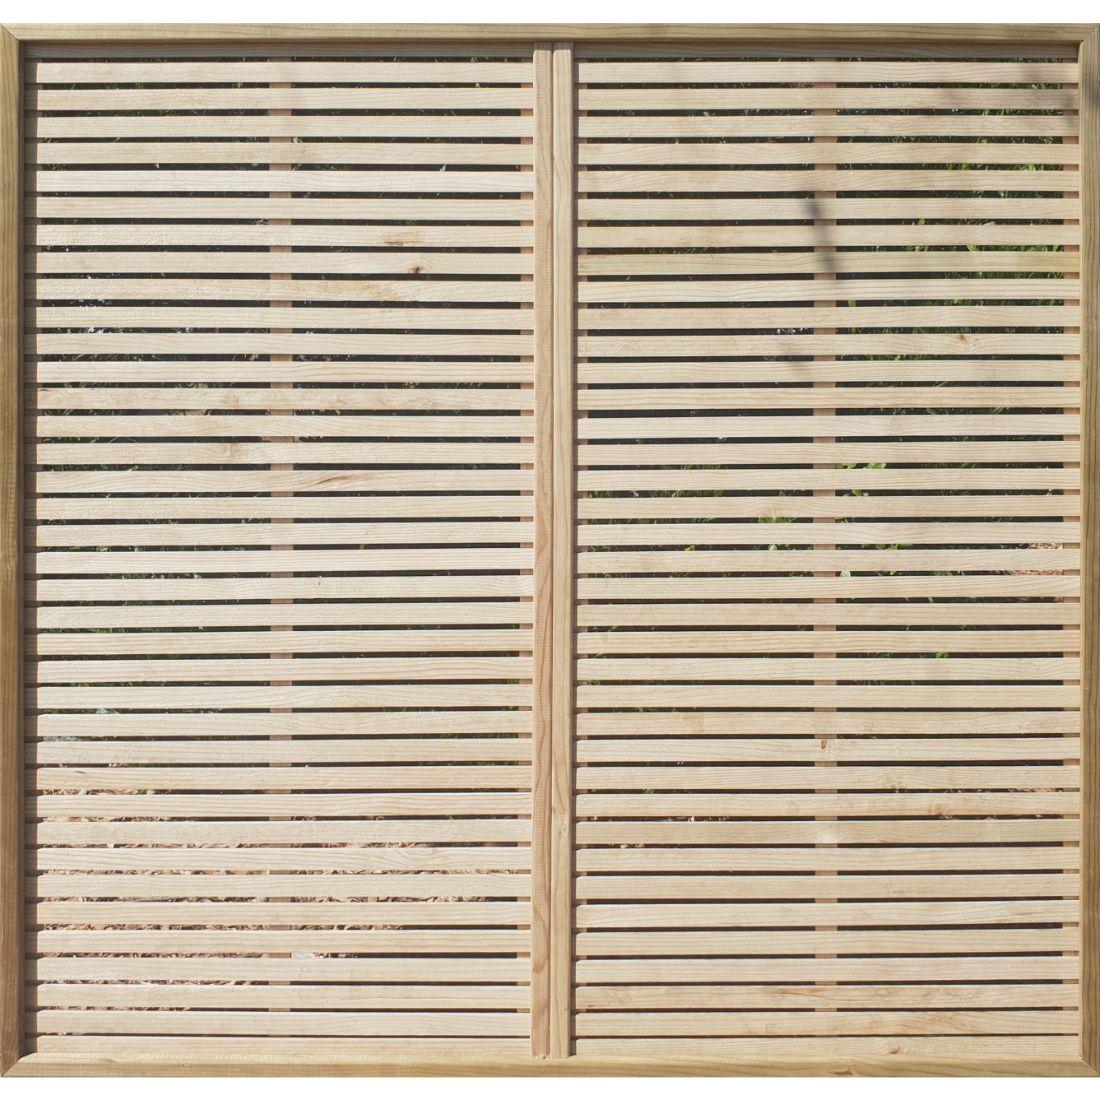 Trellis Heavy Framed Double Venetian 1800 x 1800 x 10mm